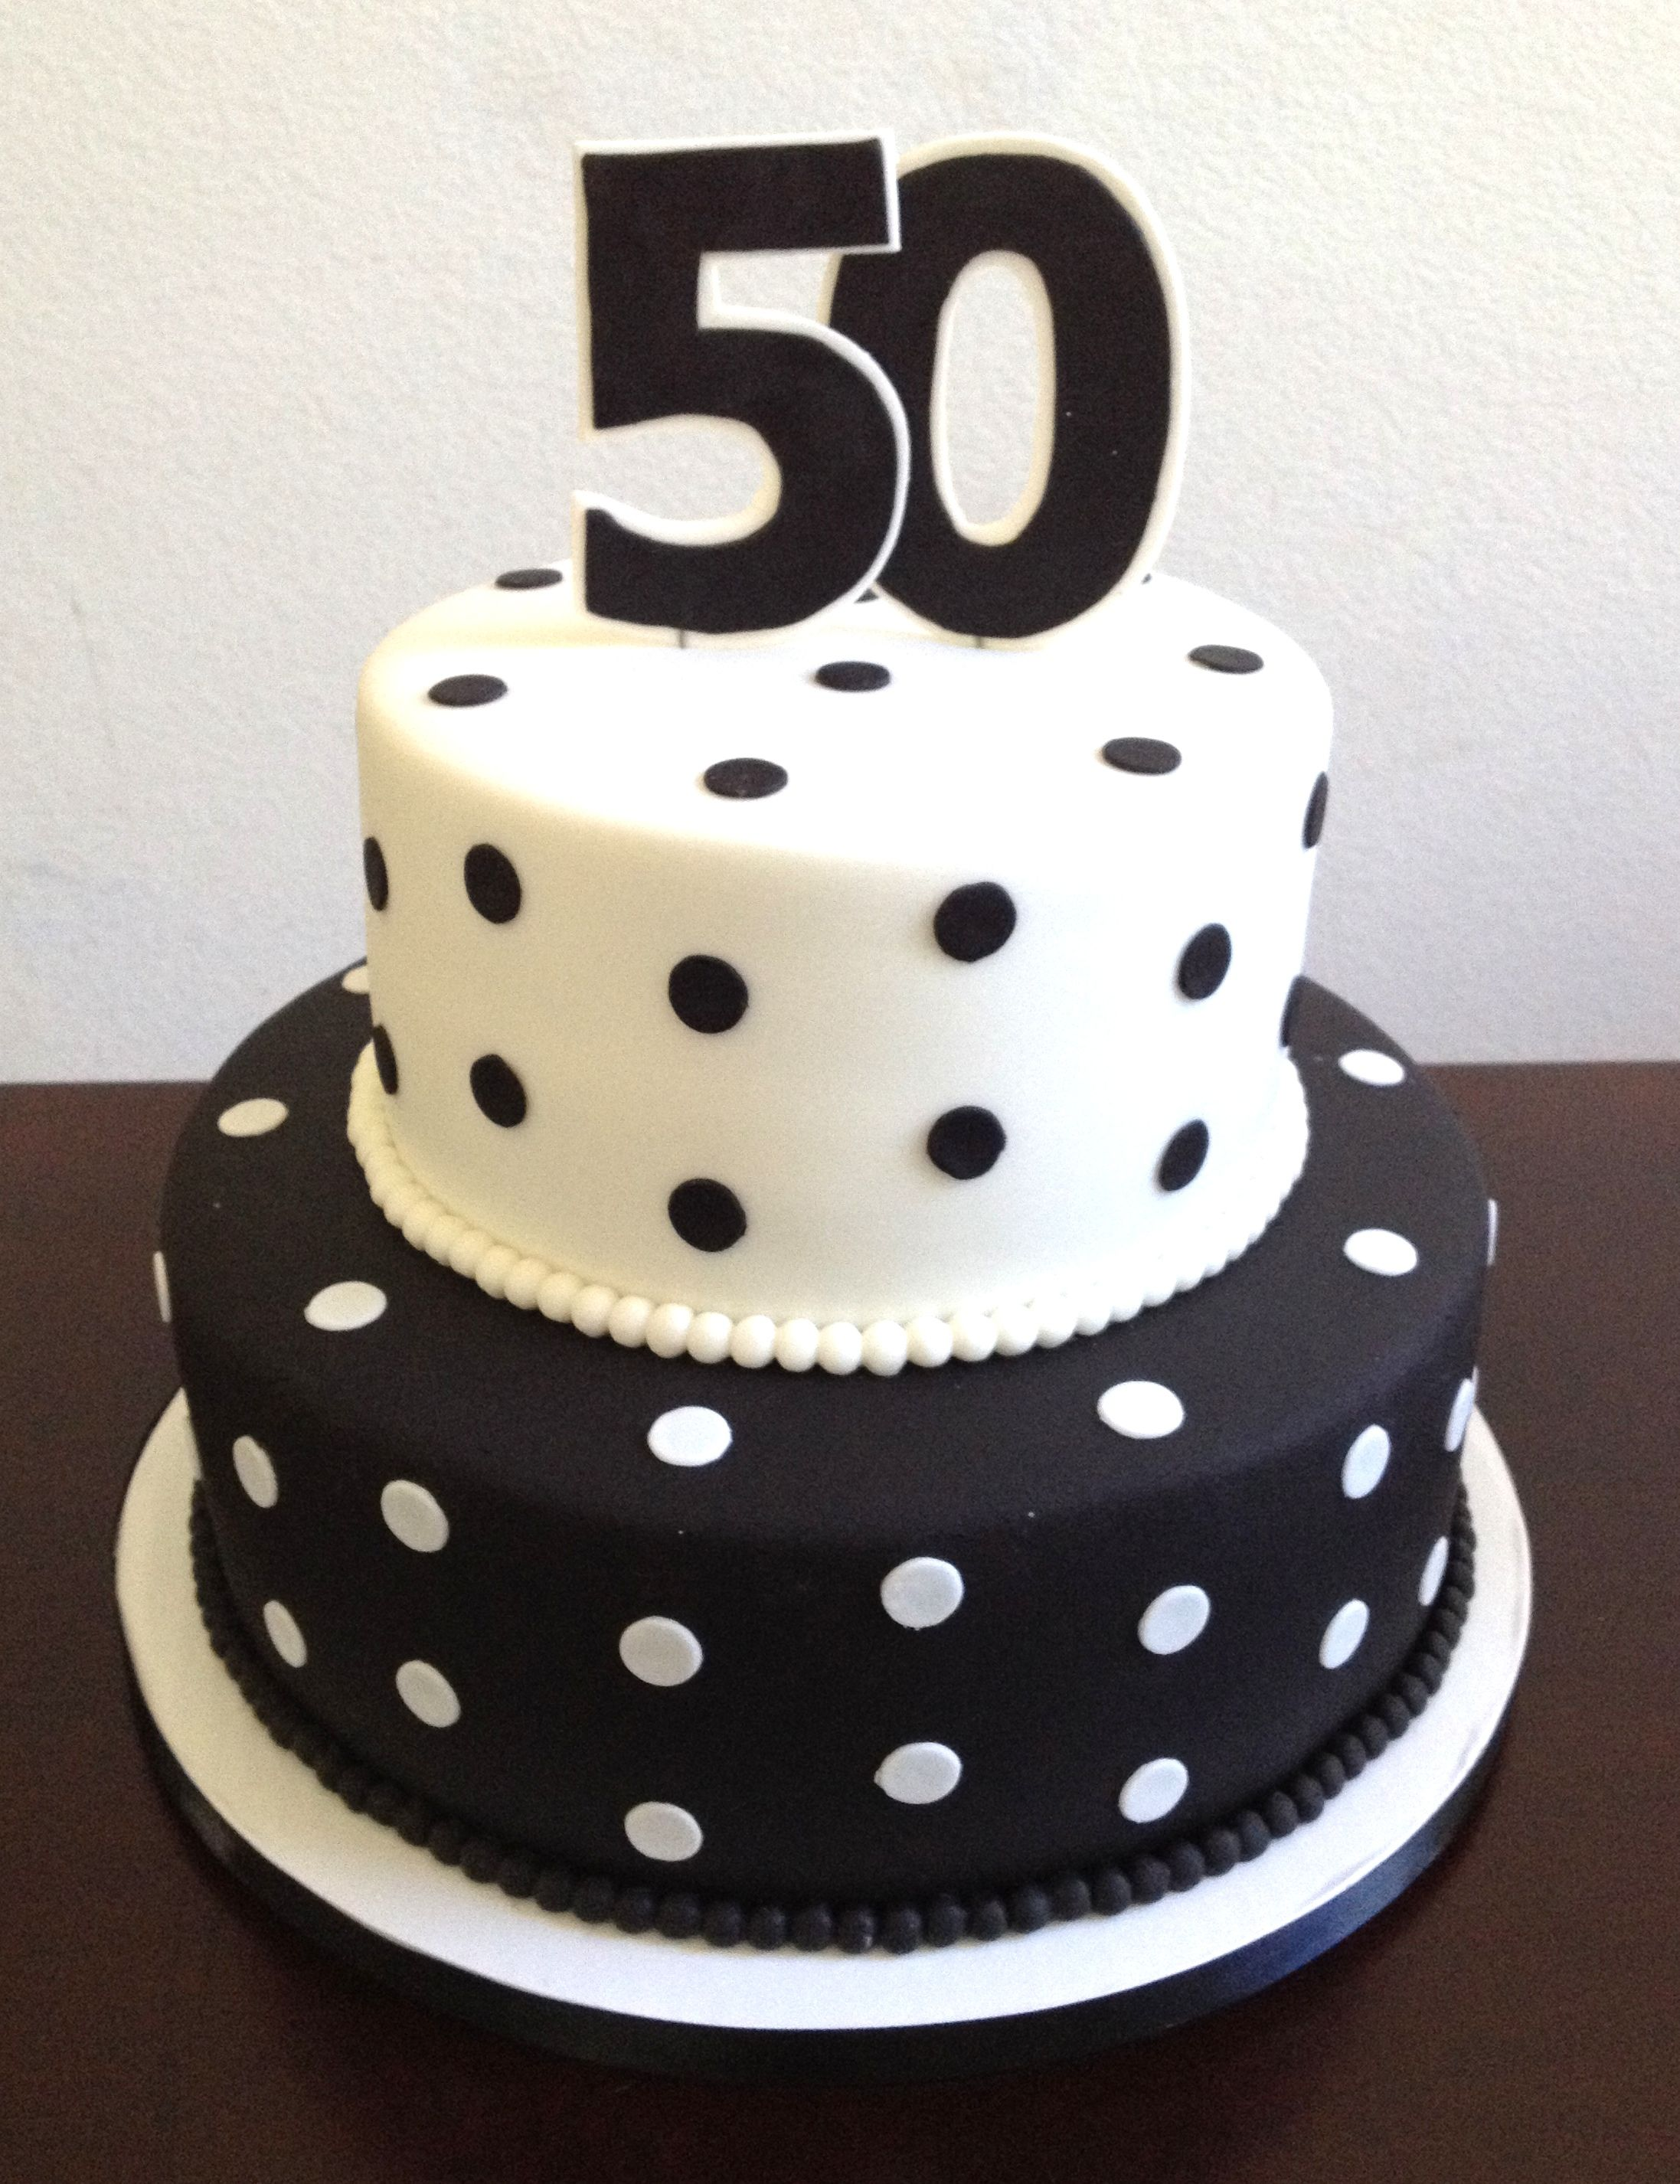 Pleasing Black And White Polka Dot 50Th Birthday Cake 50Th Birthday Cake Funny Birthday Cards Online Ioscodamsfinfo